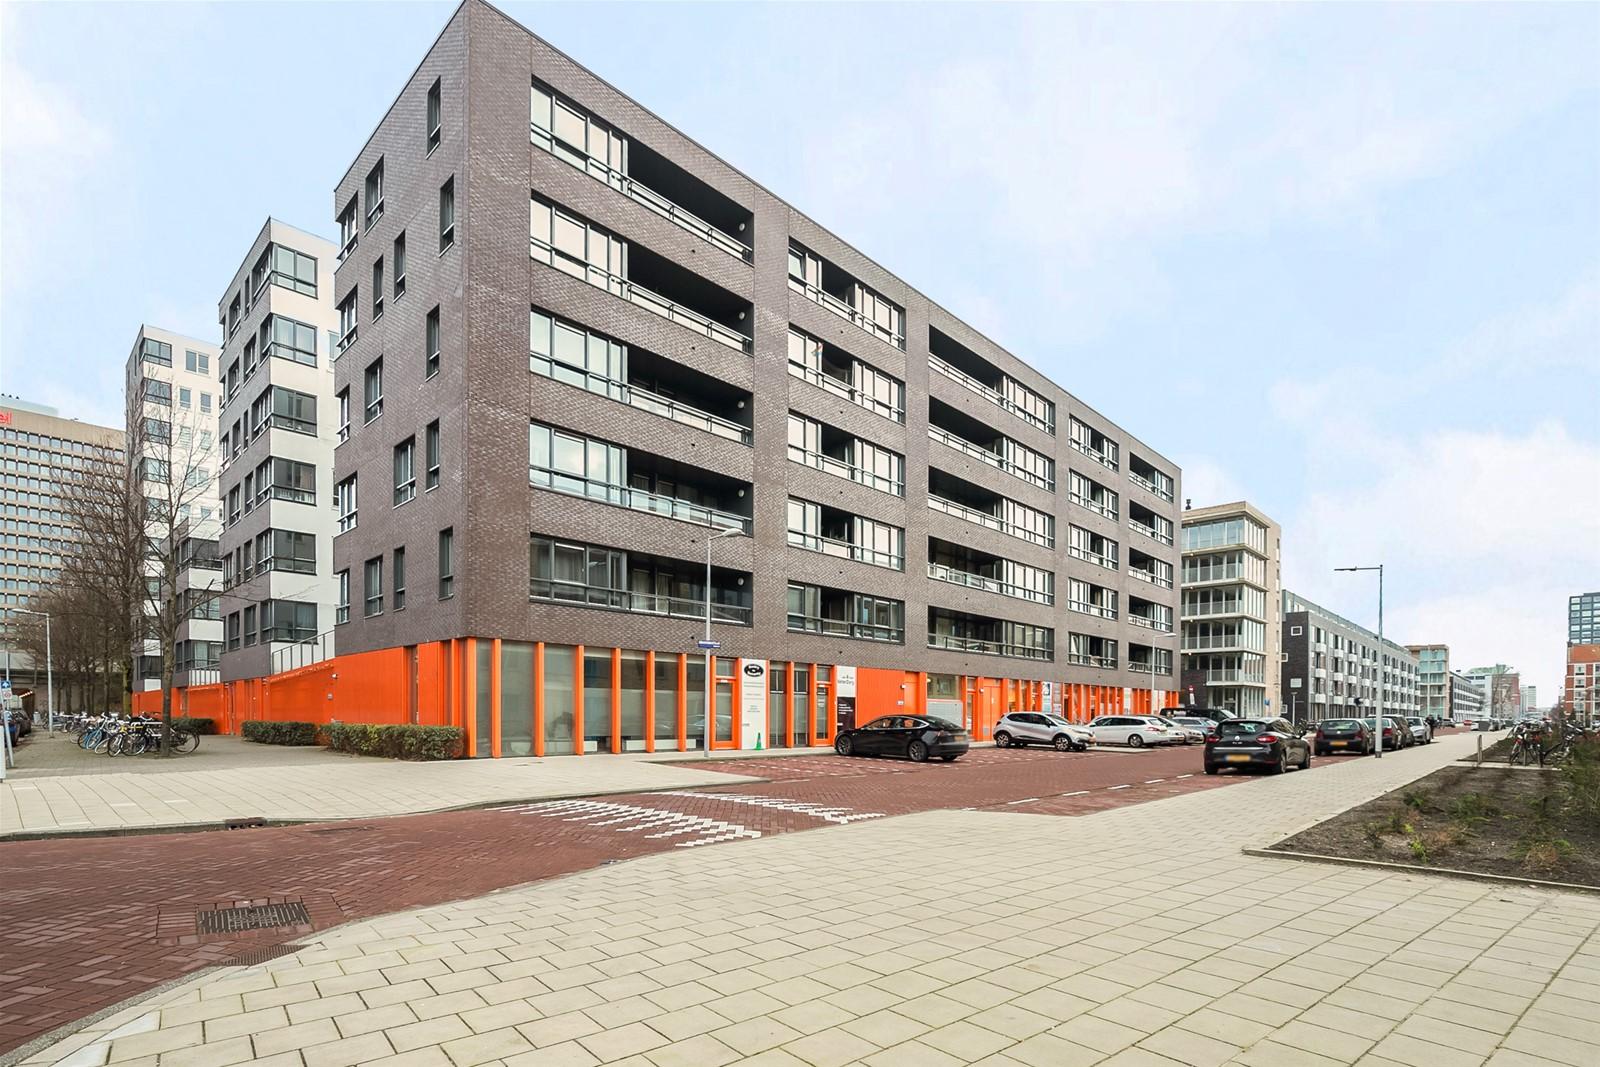 Derkinderenstraat, Amsterdam